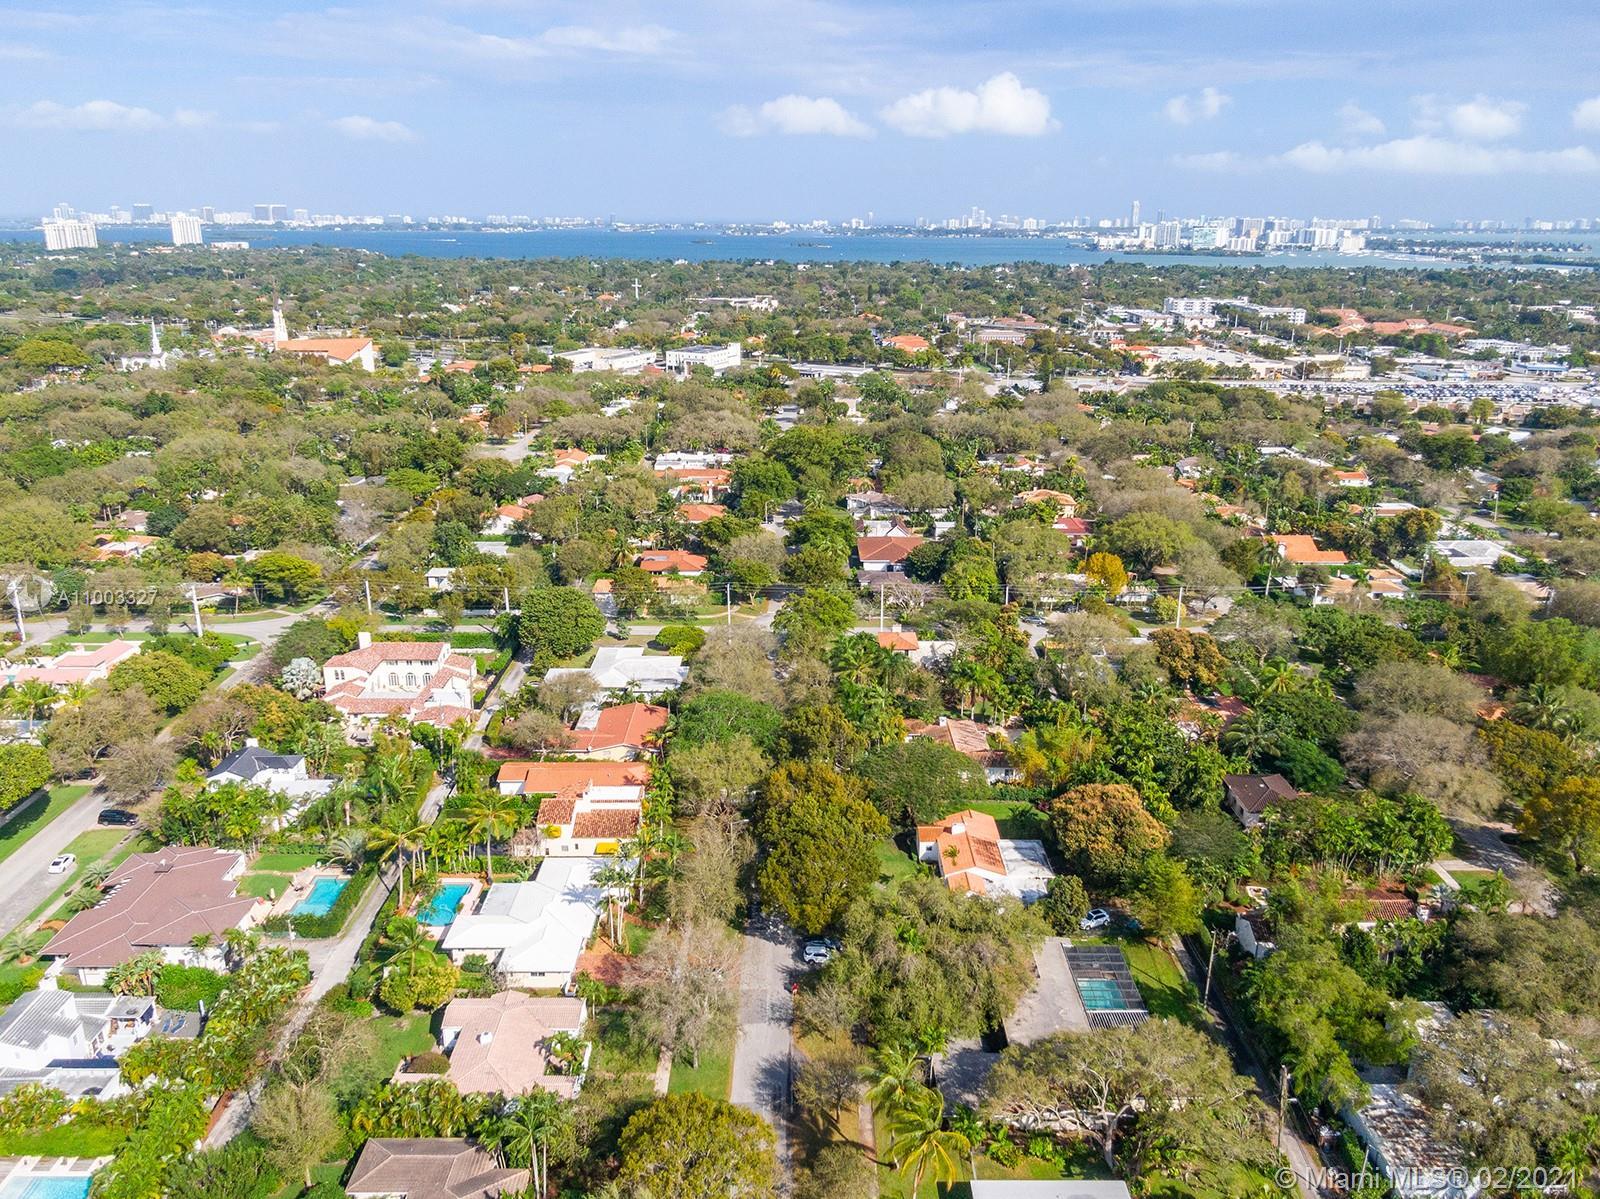 Miami Shores # - 33 - photo